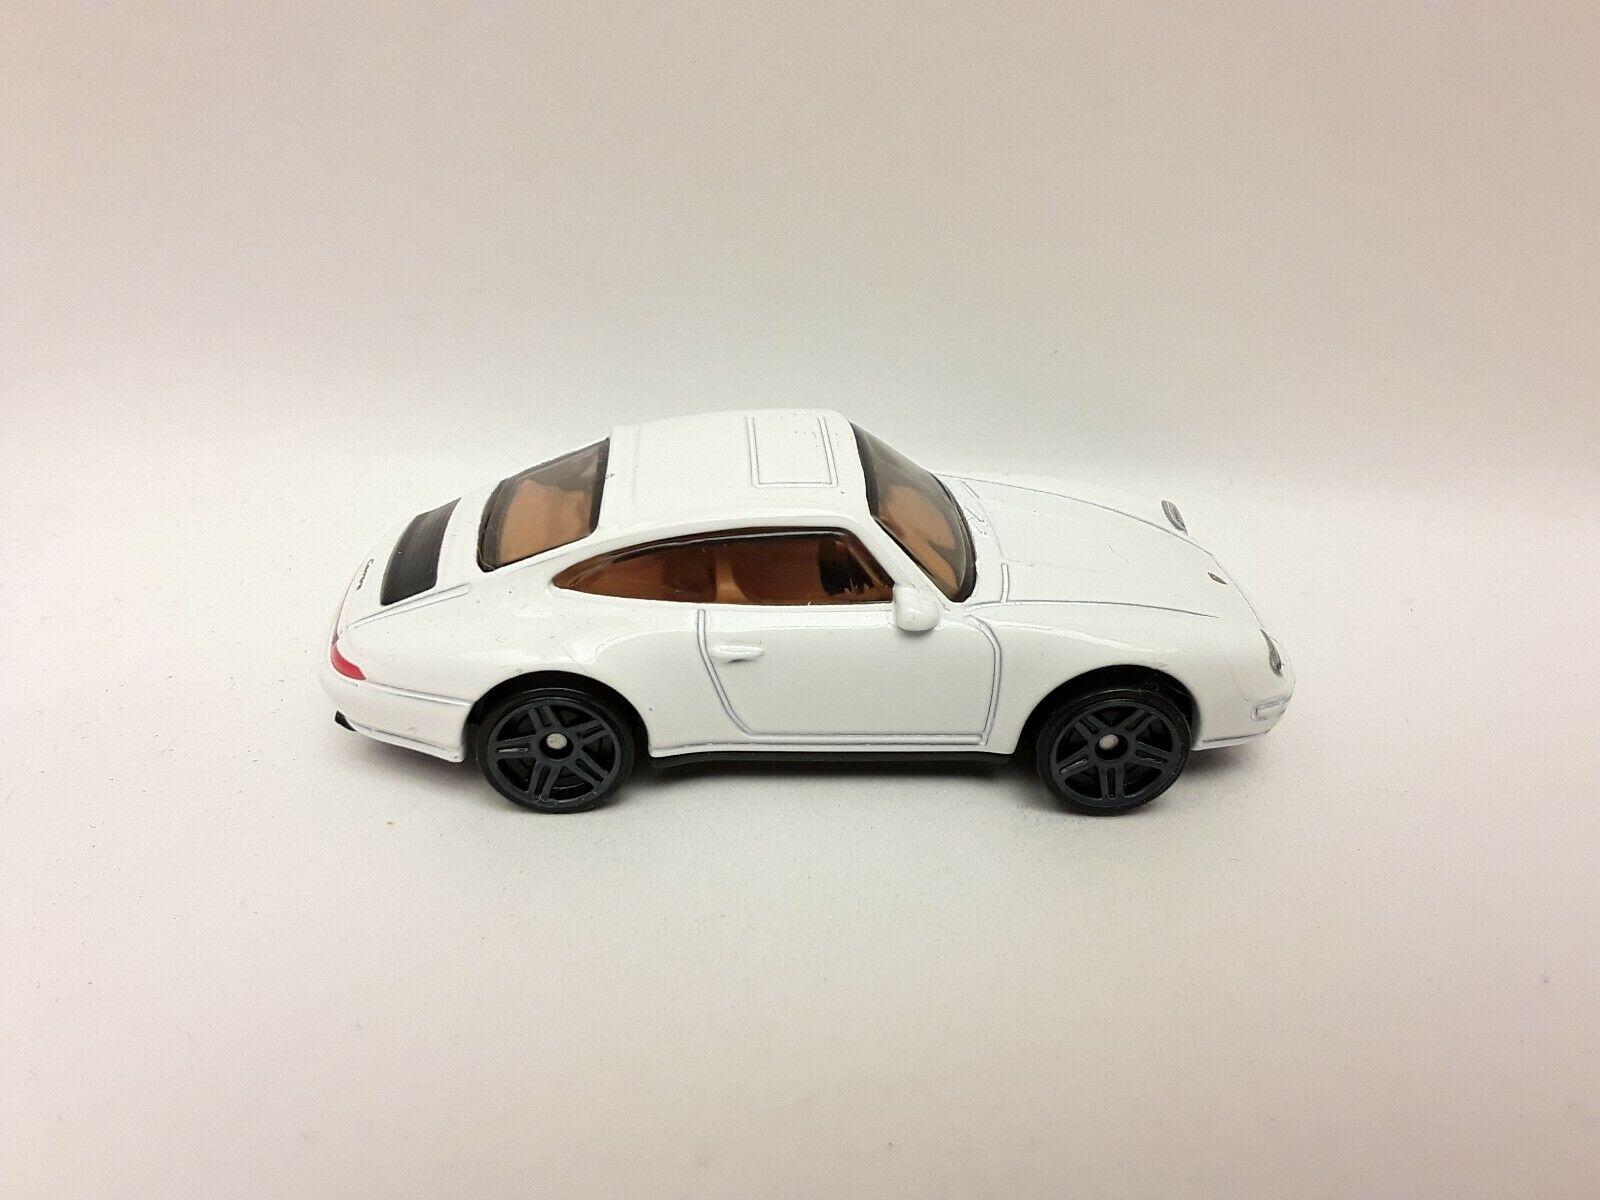 2019 Hot Wheels 1996 Porsche Carrera White New Loose